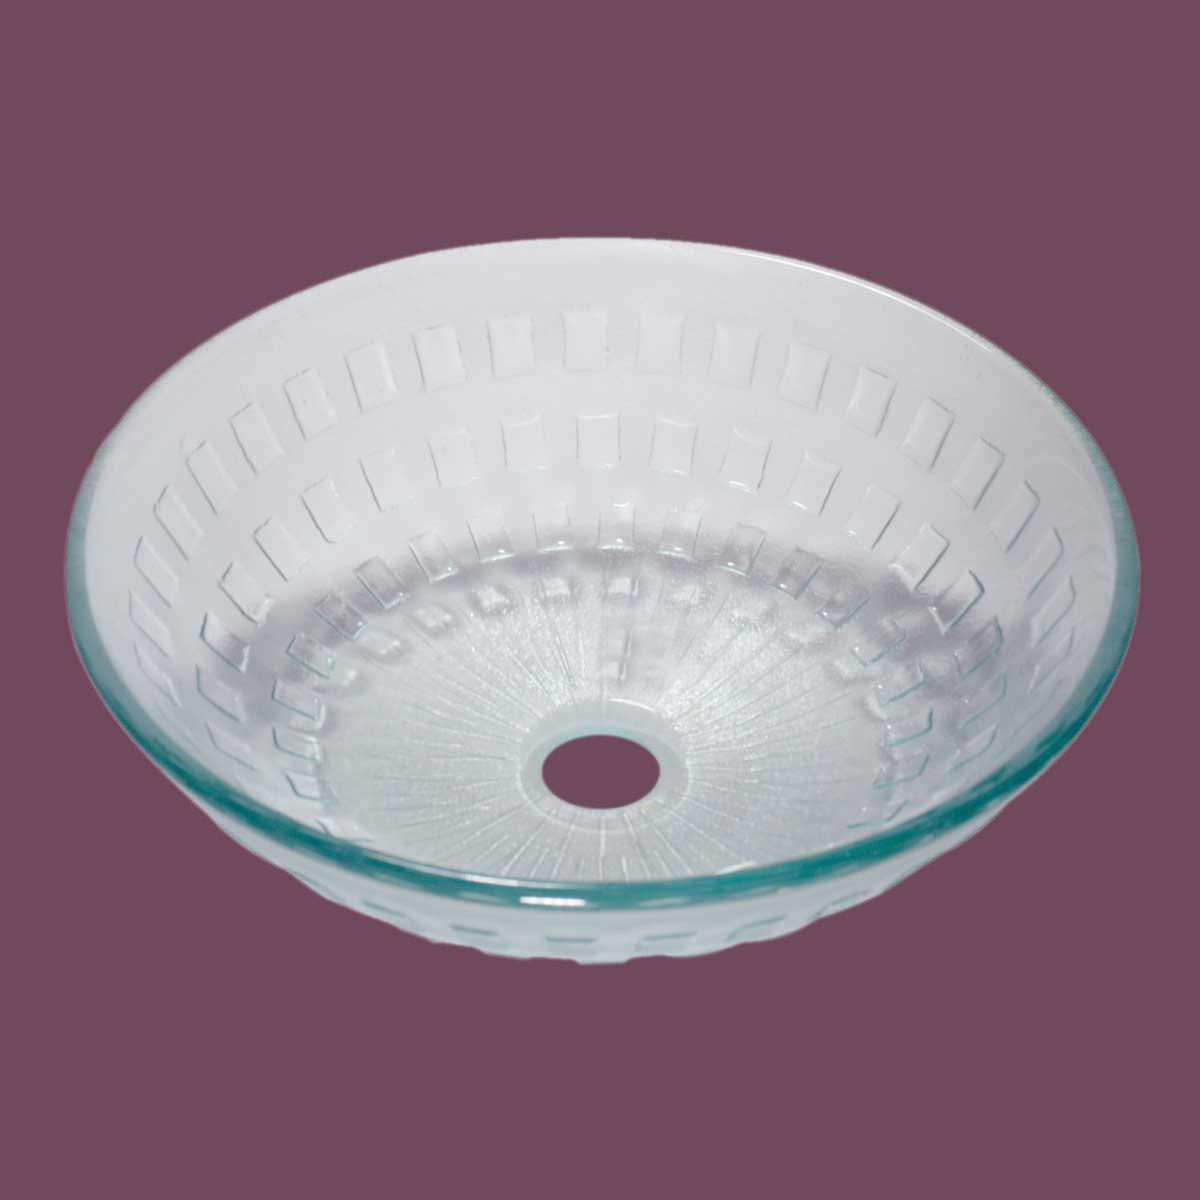 U003cPREu003eRenovatoru0027s Supply Bathroom Tempered Clear Glass Vessel Sink Round  Pop Up ...